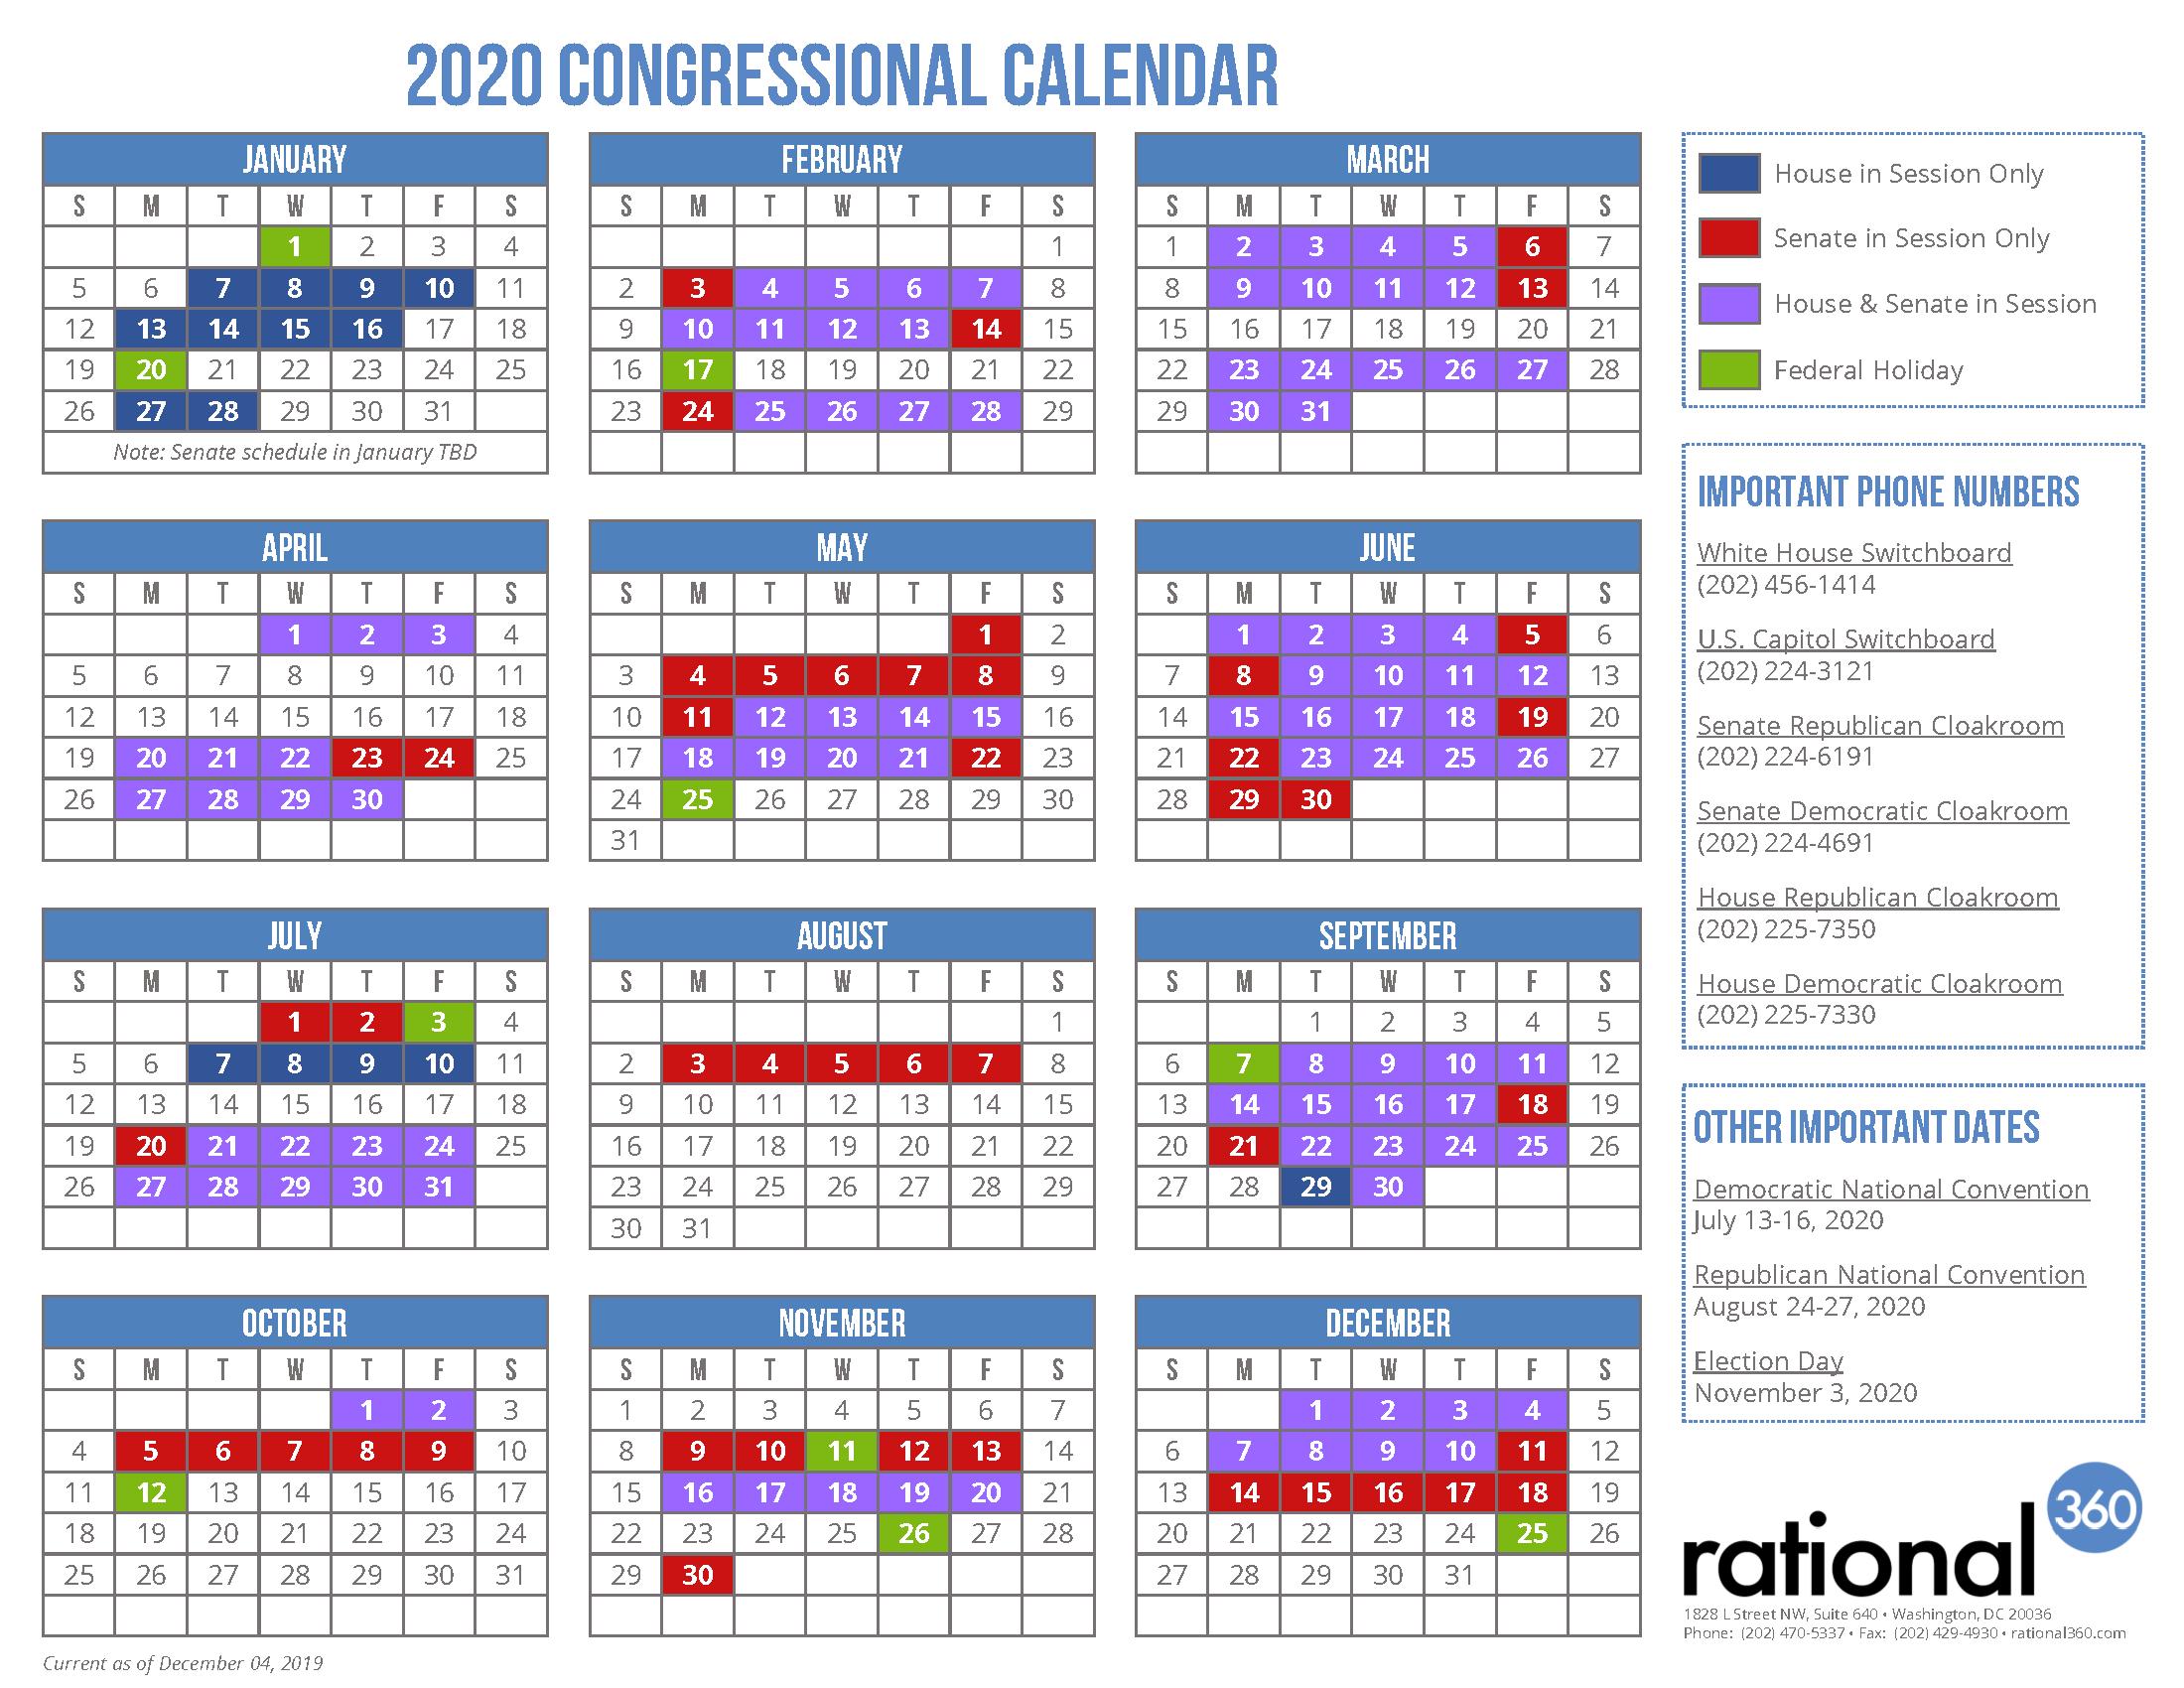 2022 Congressional Calendar.2020 Combined Congressional Calendar Rational 360